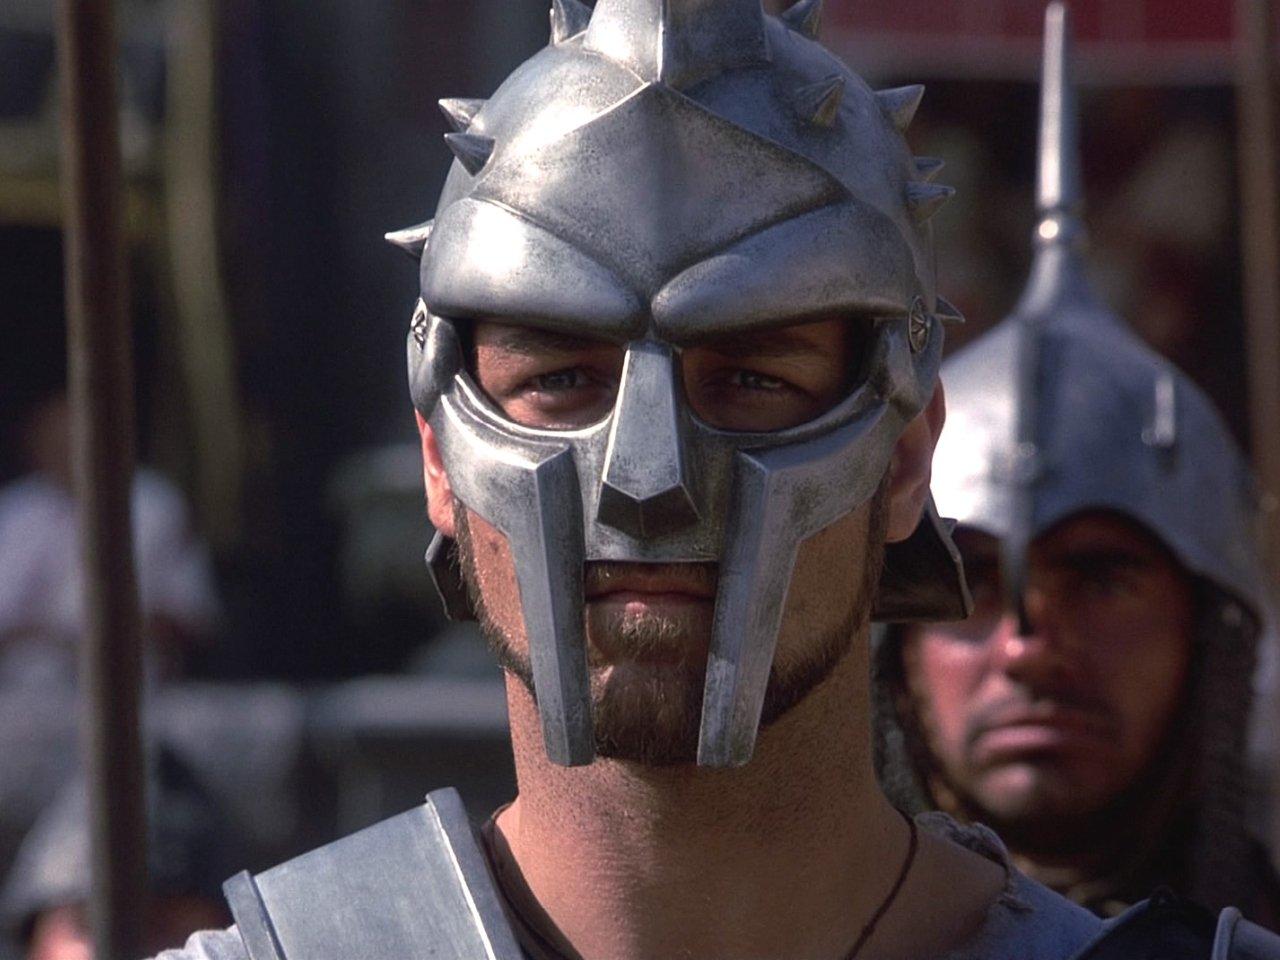 http://3.bp.blogspot.com/-P4OufGX-9zI/T7BqzeRv_VI/AAAAAAAACDk/MyL59Yu82_Q/s1600/Gladiator-003.jpg